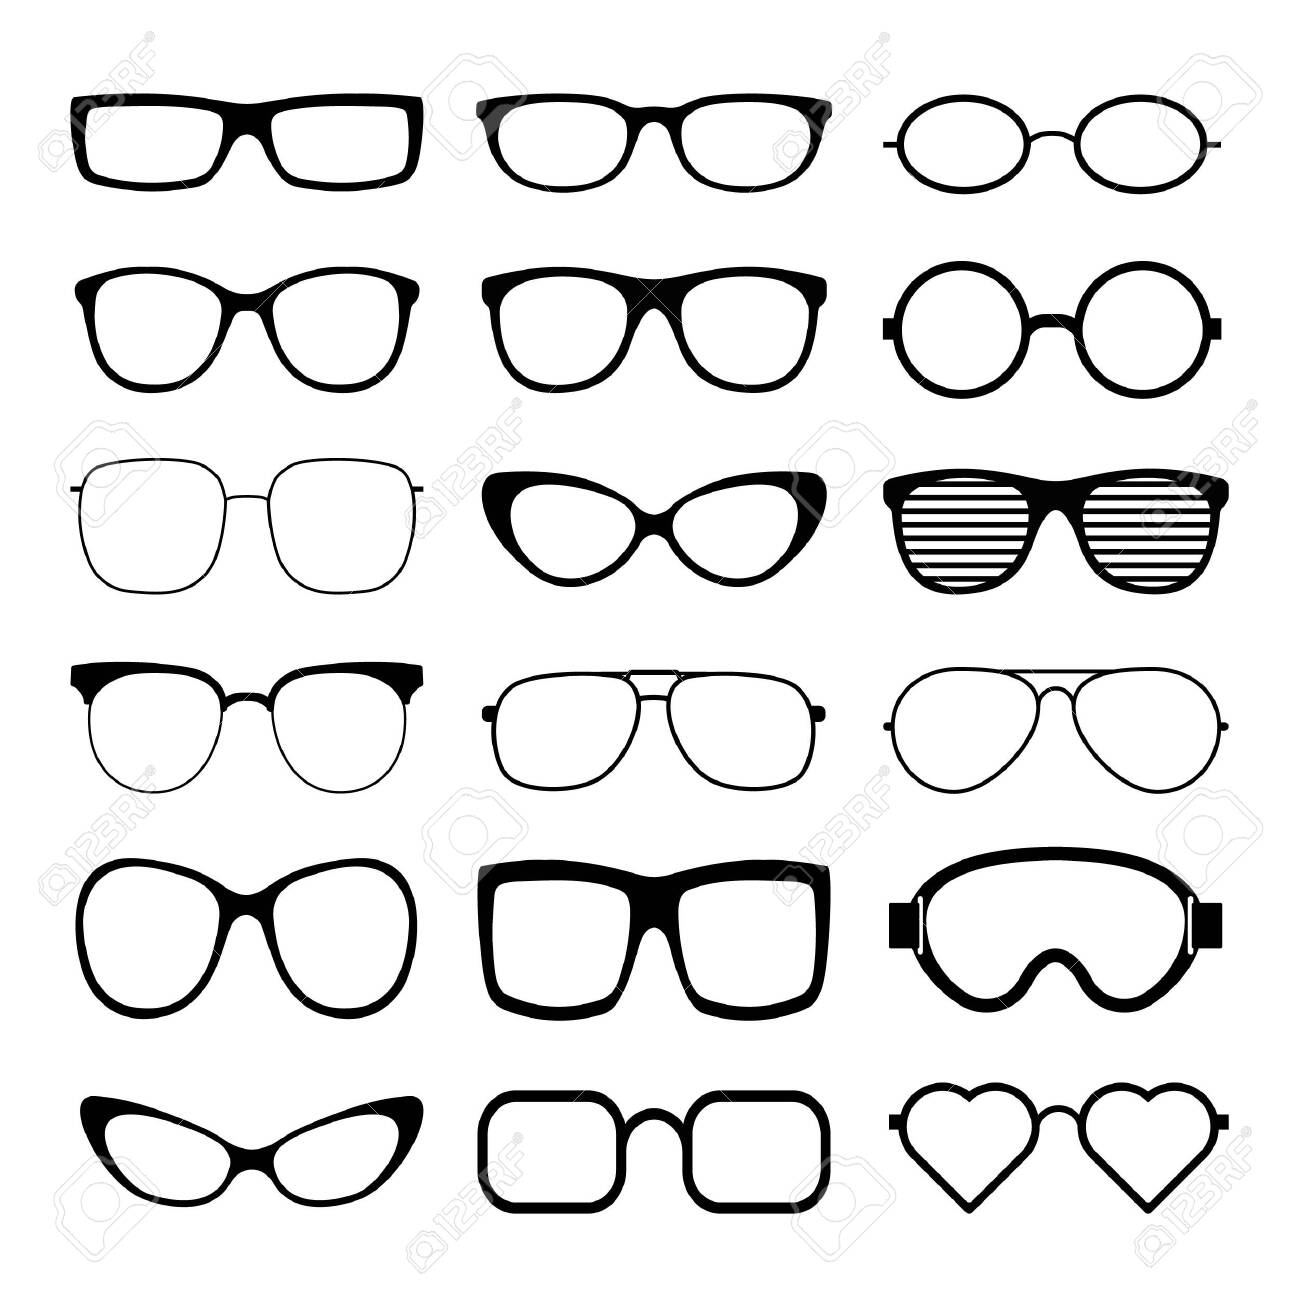 Sunglasses icon set vector template. Transparent sunglass, mens and women glasses silhouette. Vector illustration. - 144994435